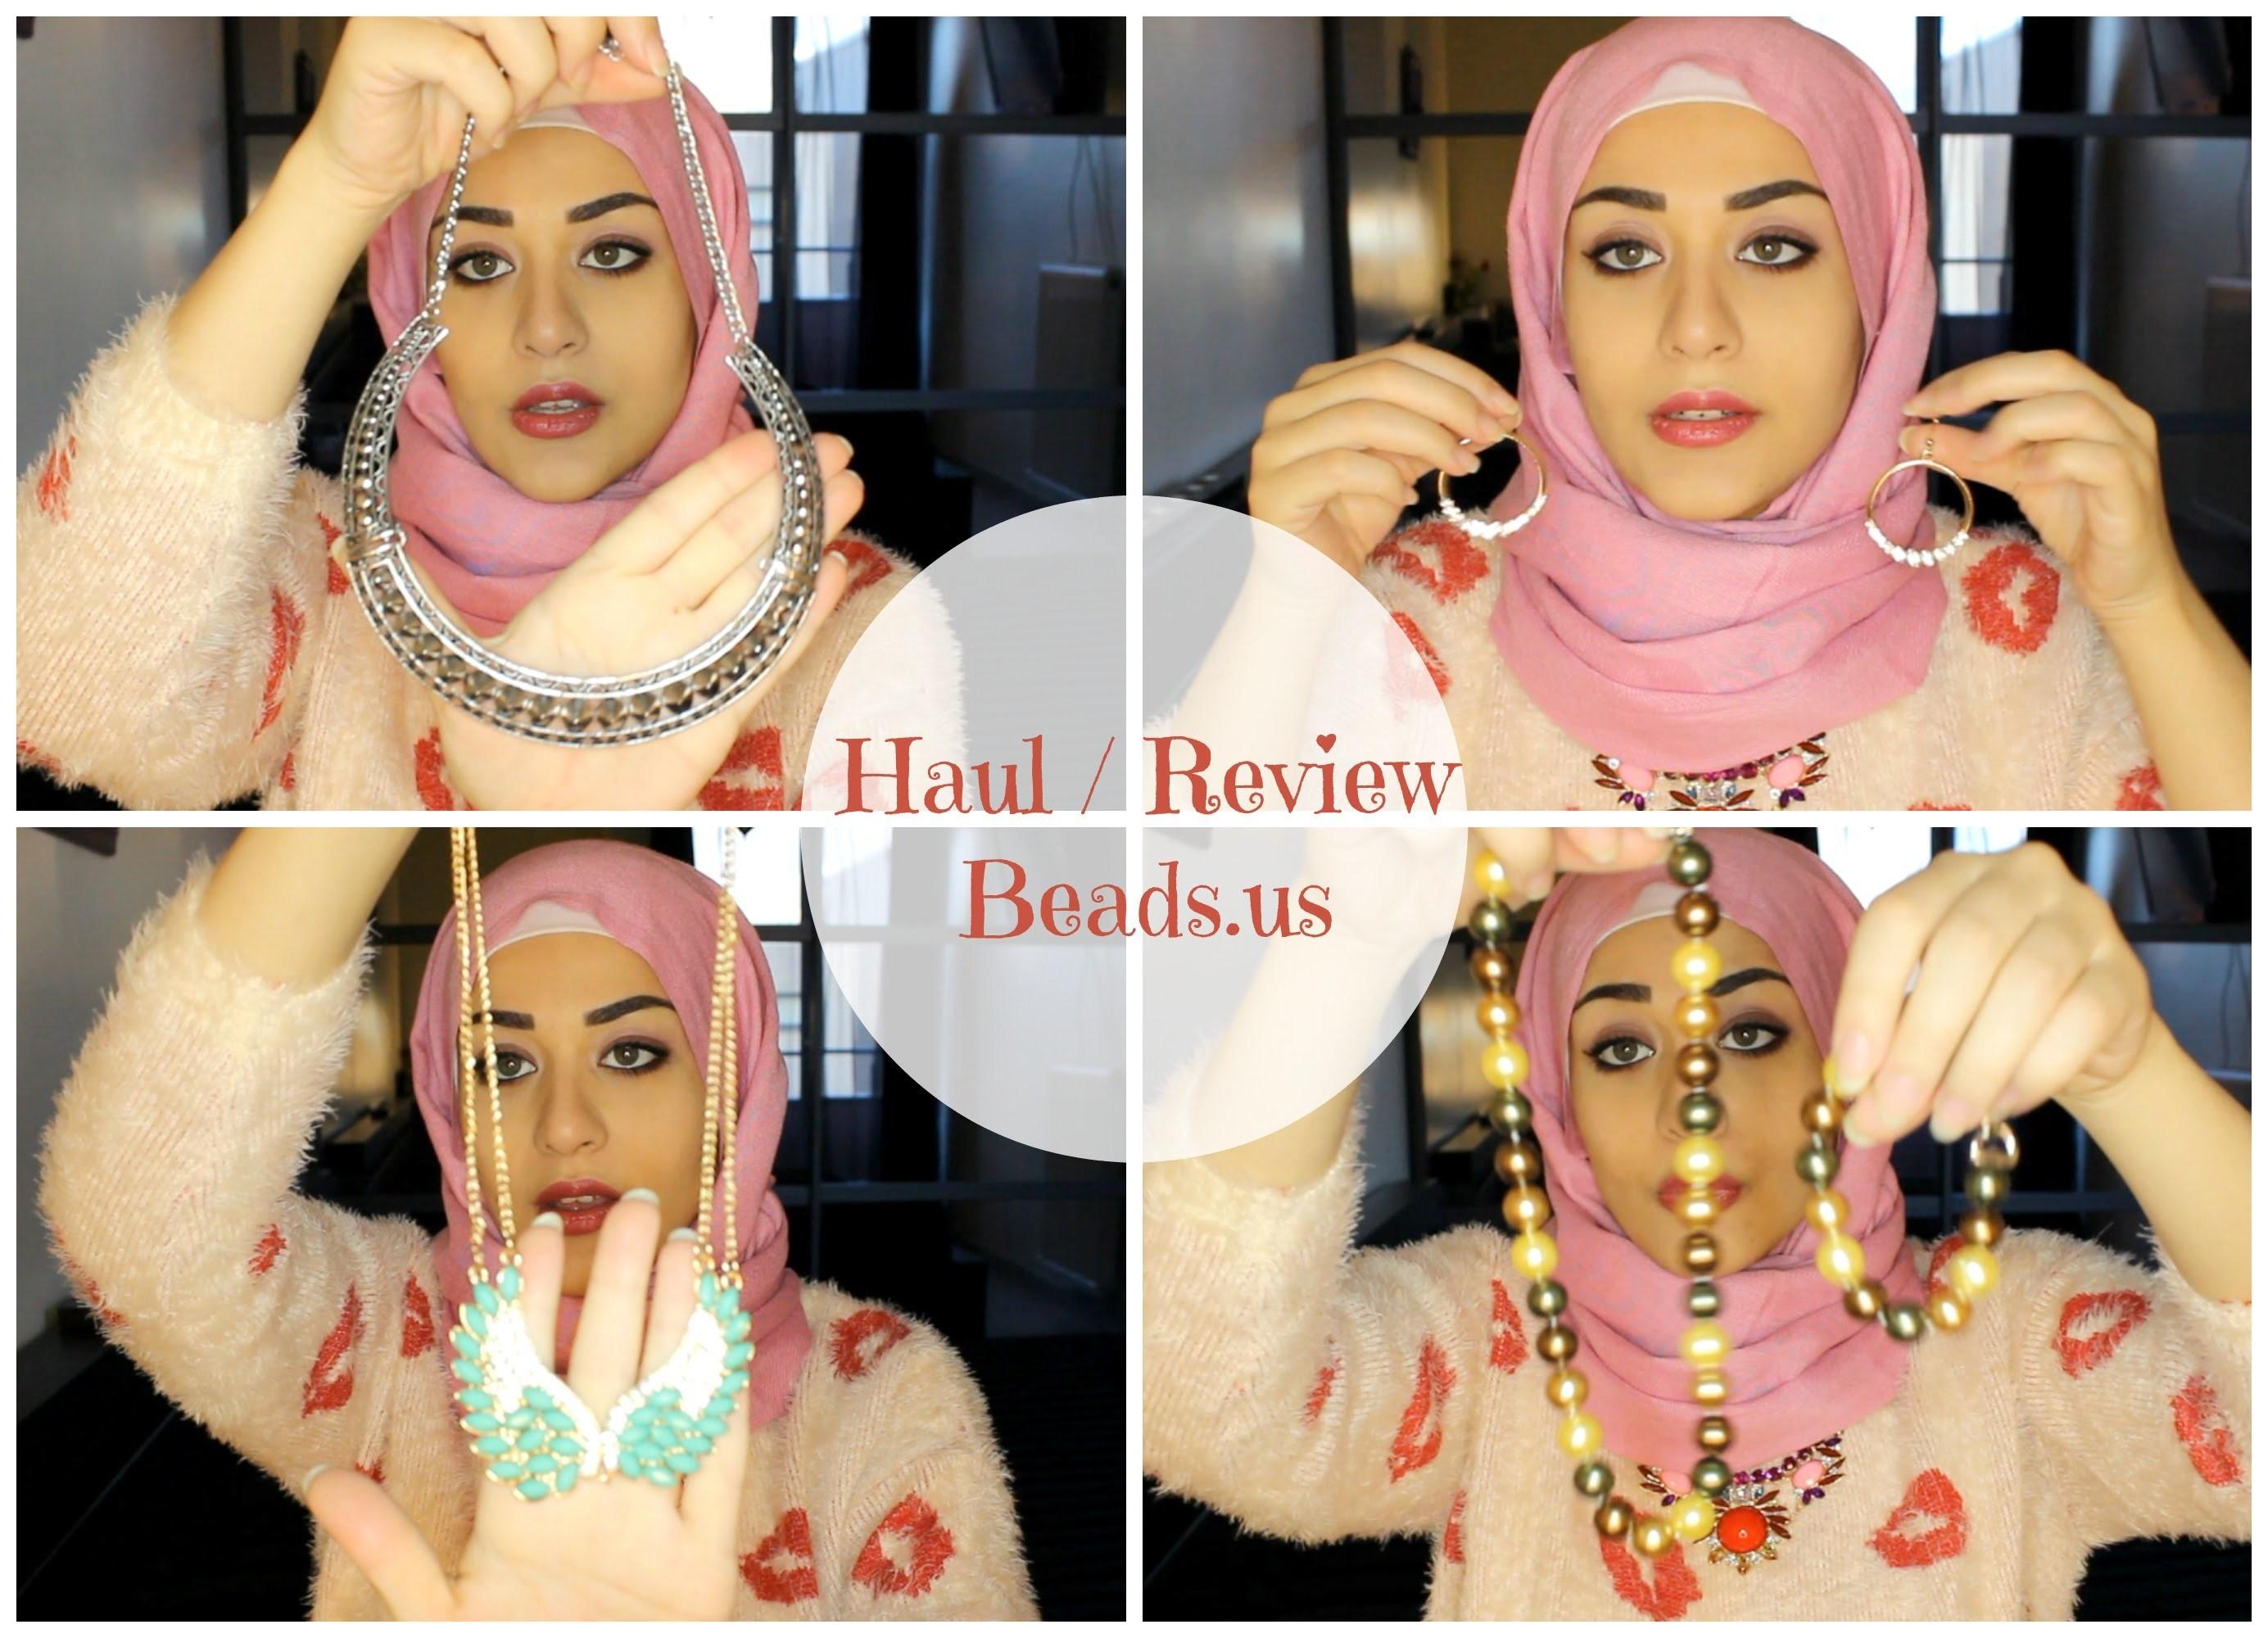 Haul. Review - Haul. Revue : Beads.us